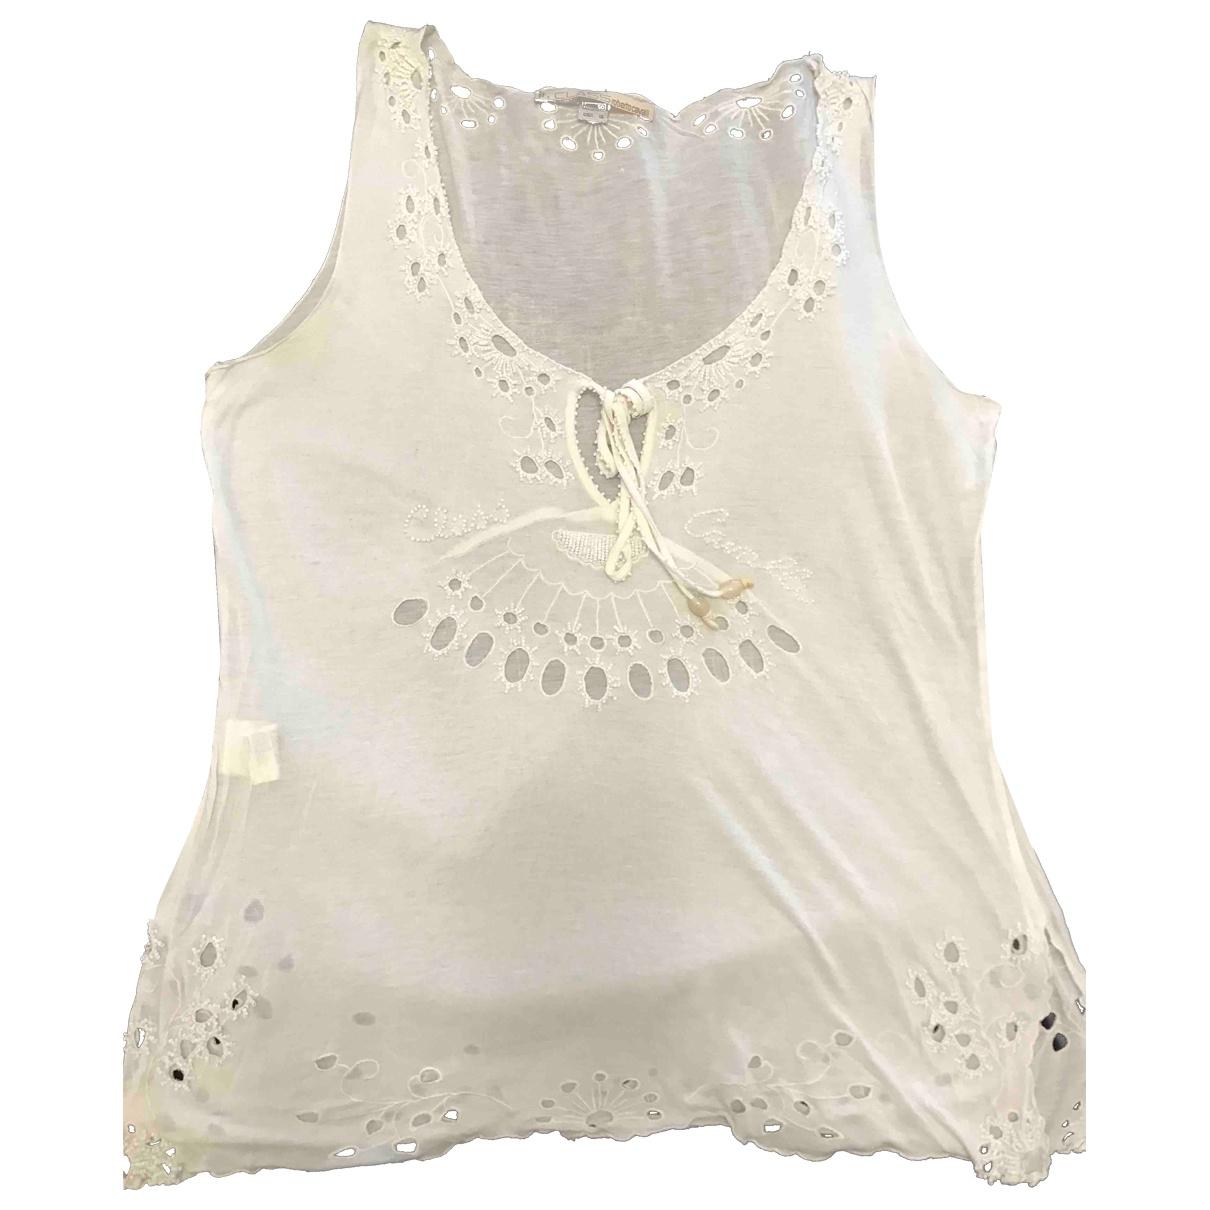 Class Cavalli \N White Glitter  top for Women 50-52 IT